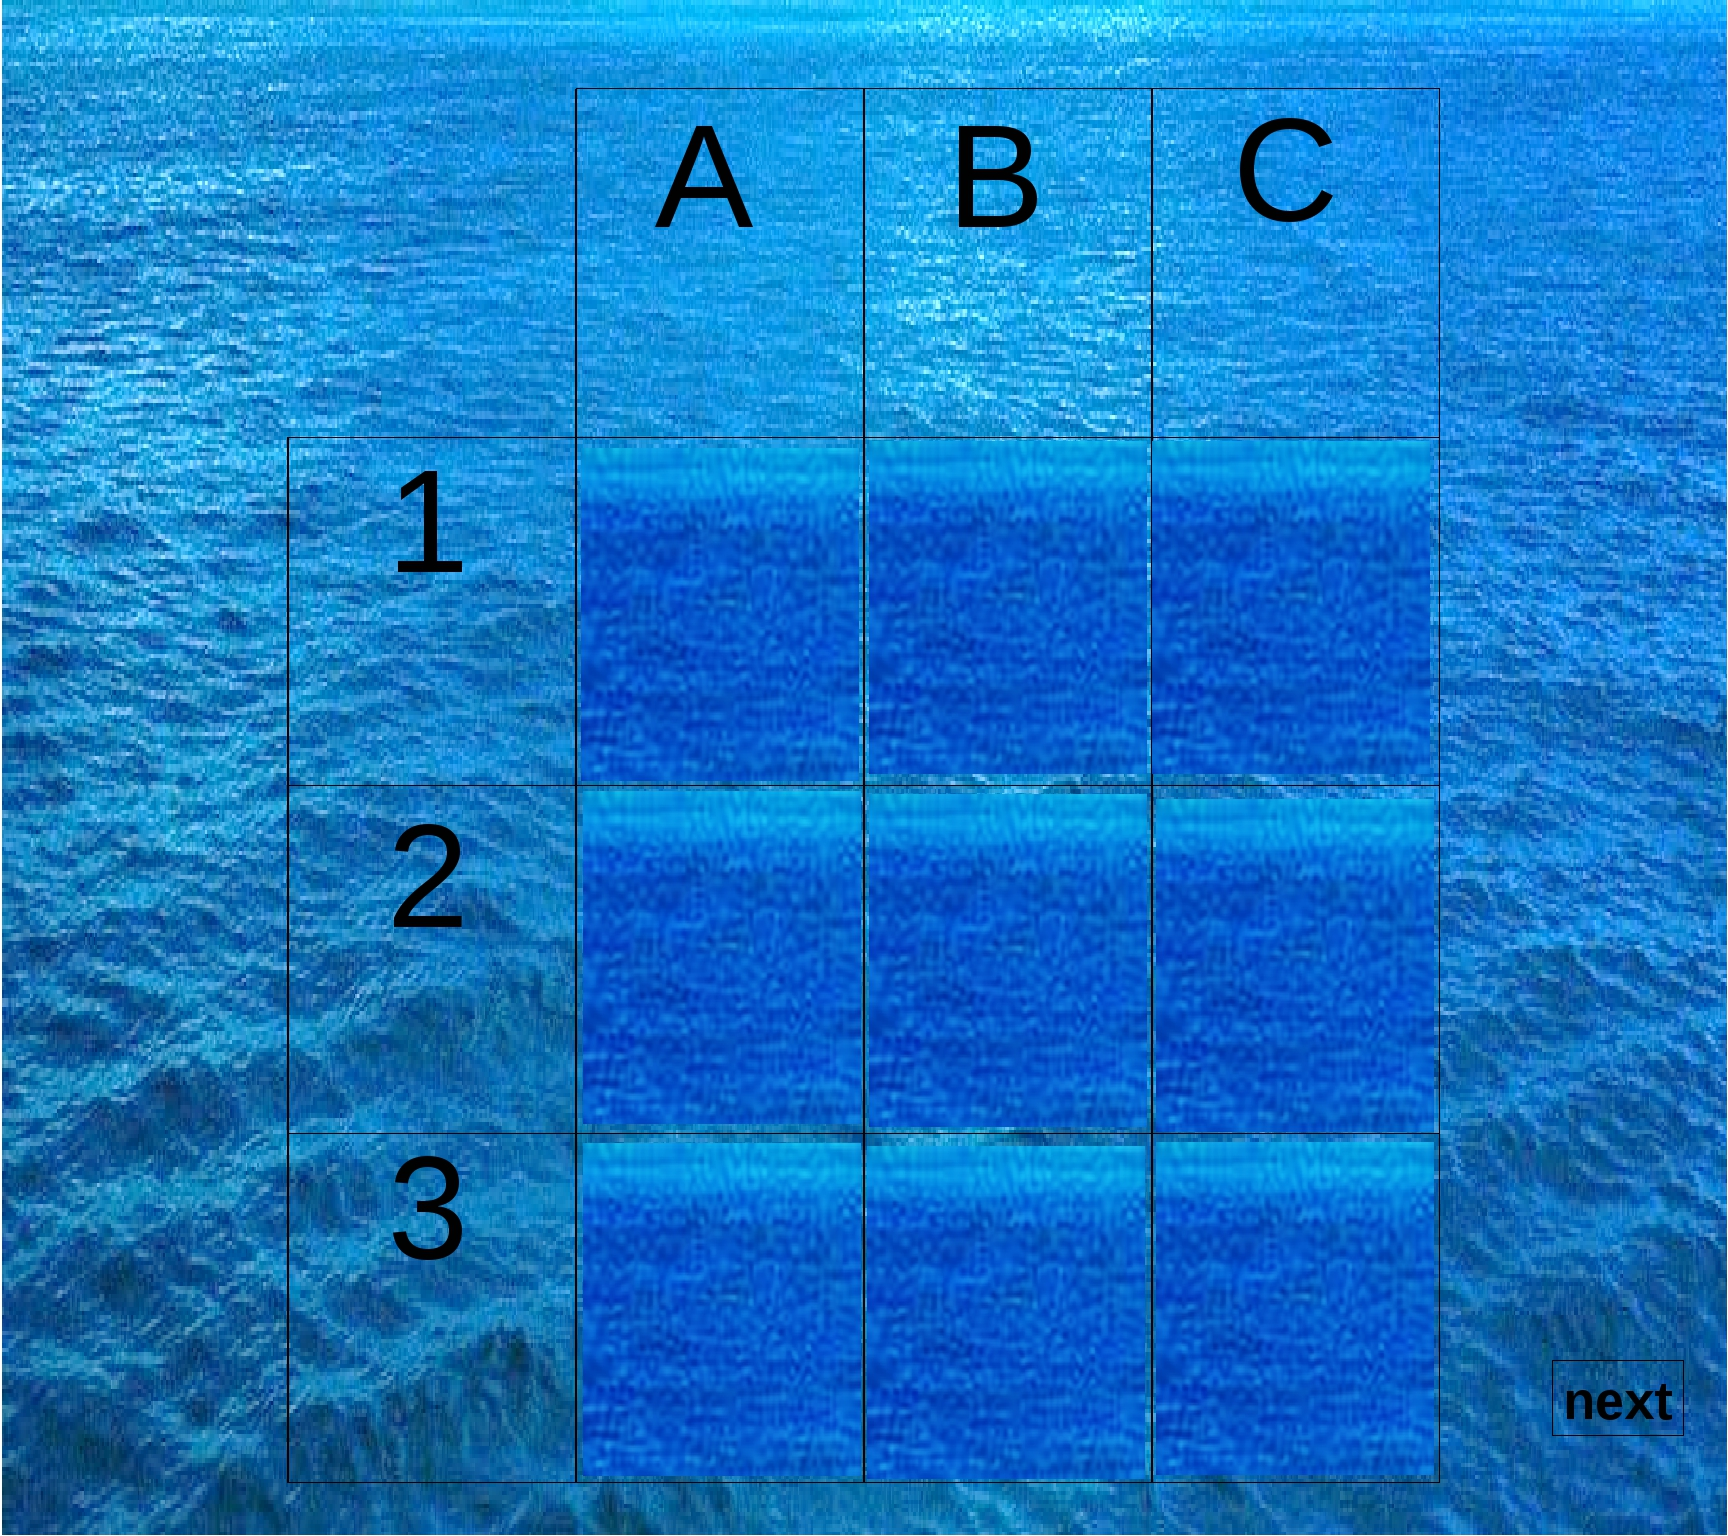 A B C 1 2 3 next